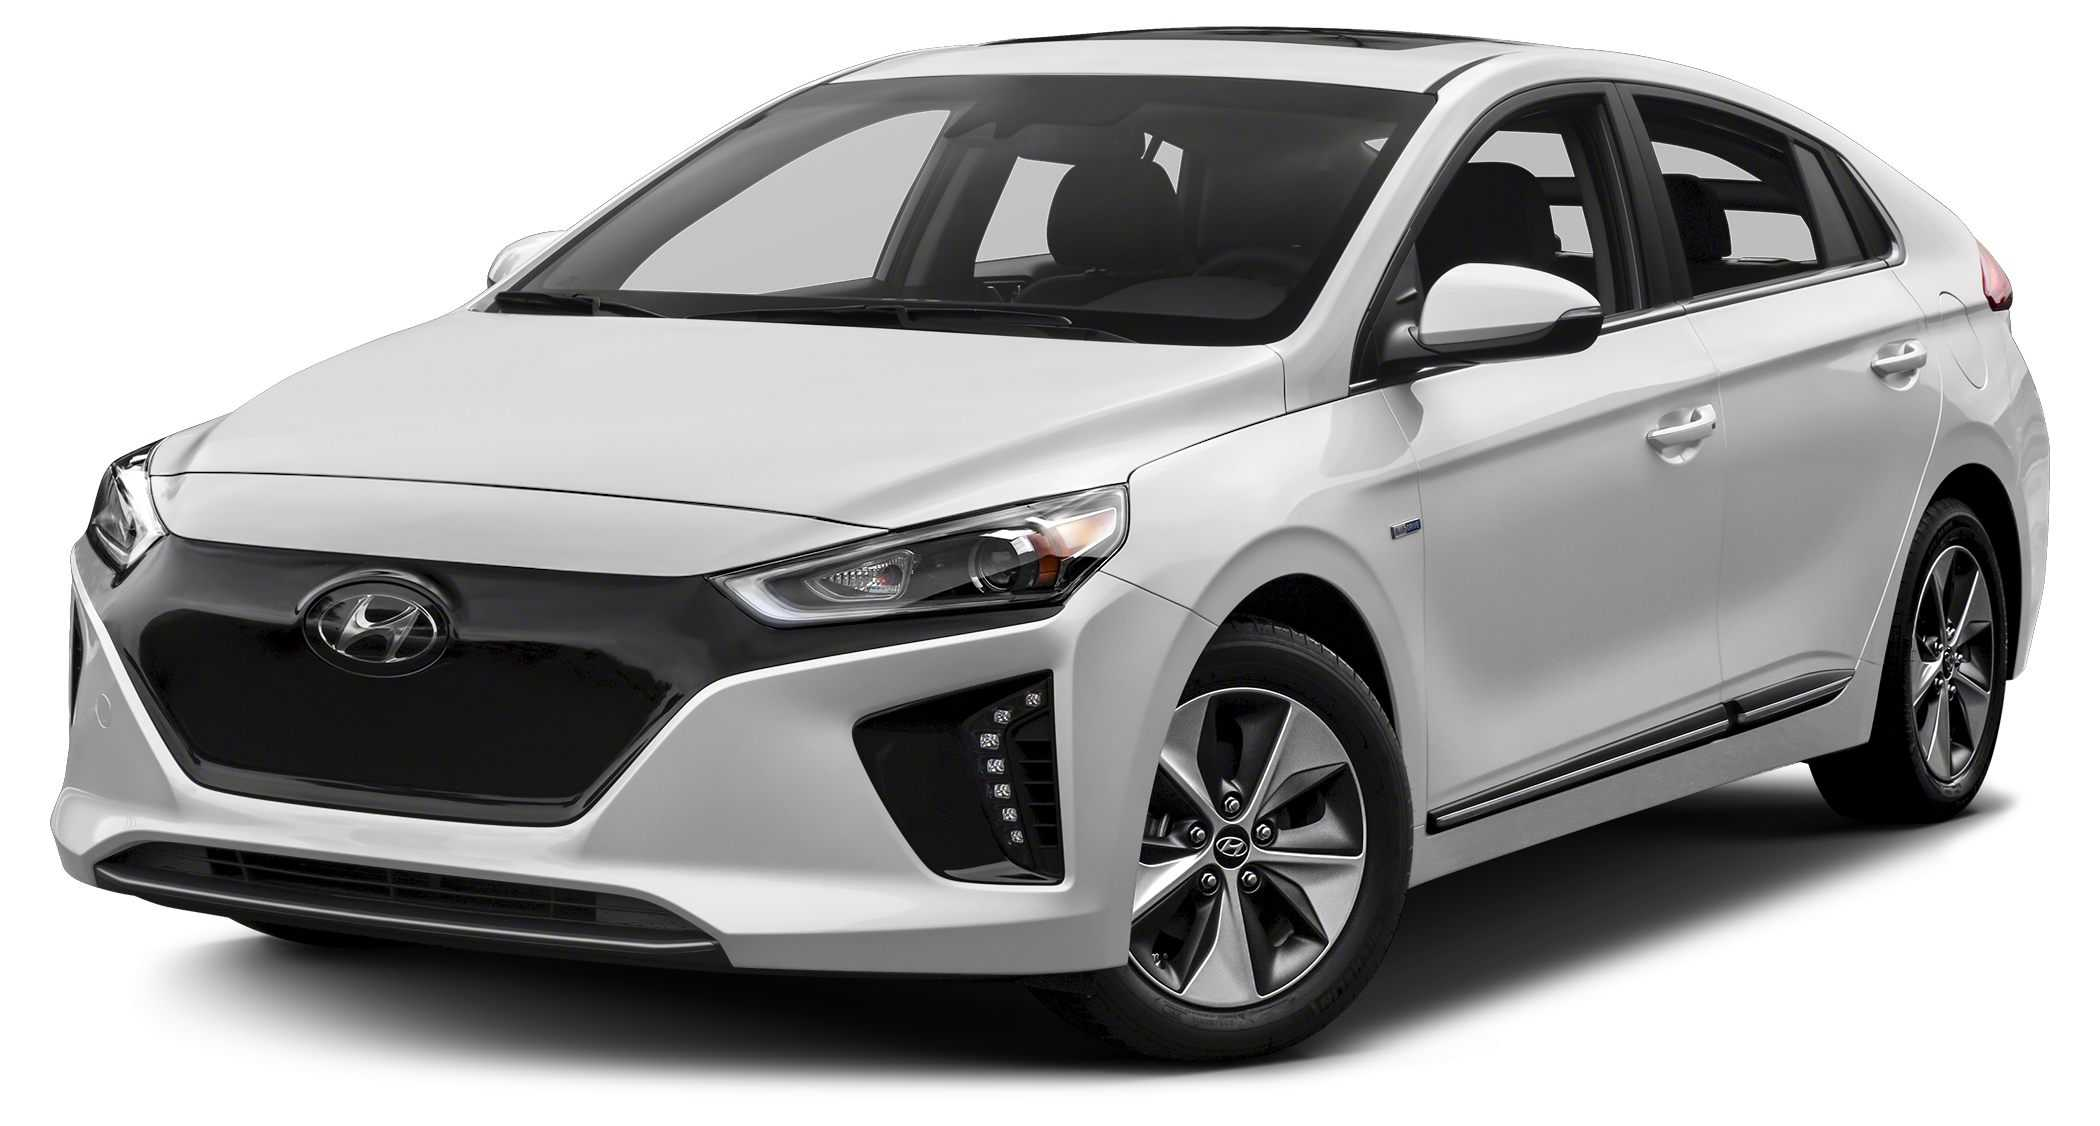 used Hyundai Ioniq 2018 vin: KMHC05LH1JU024681